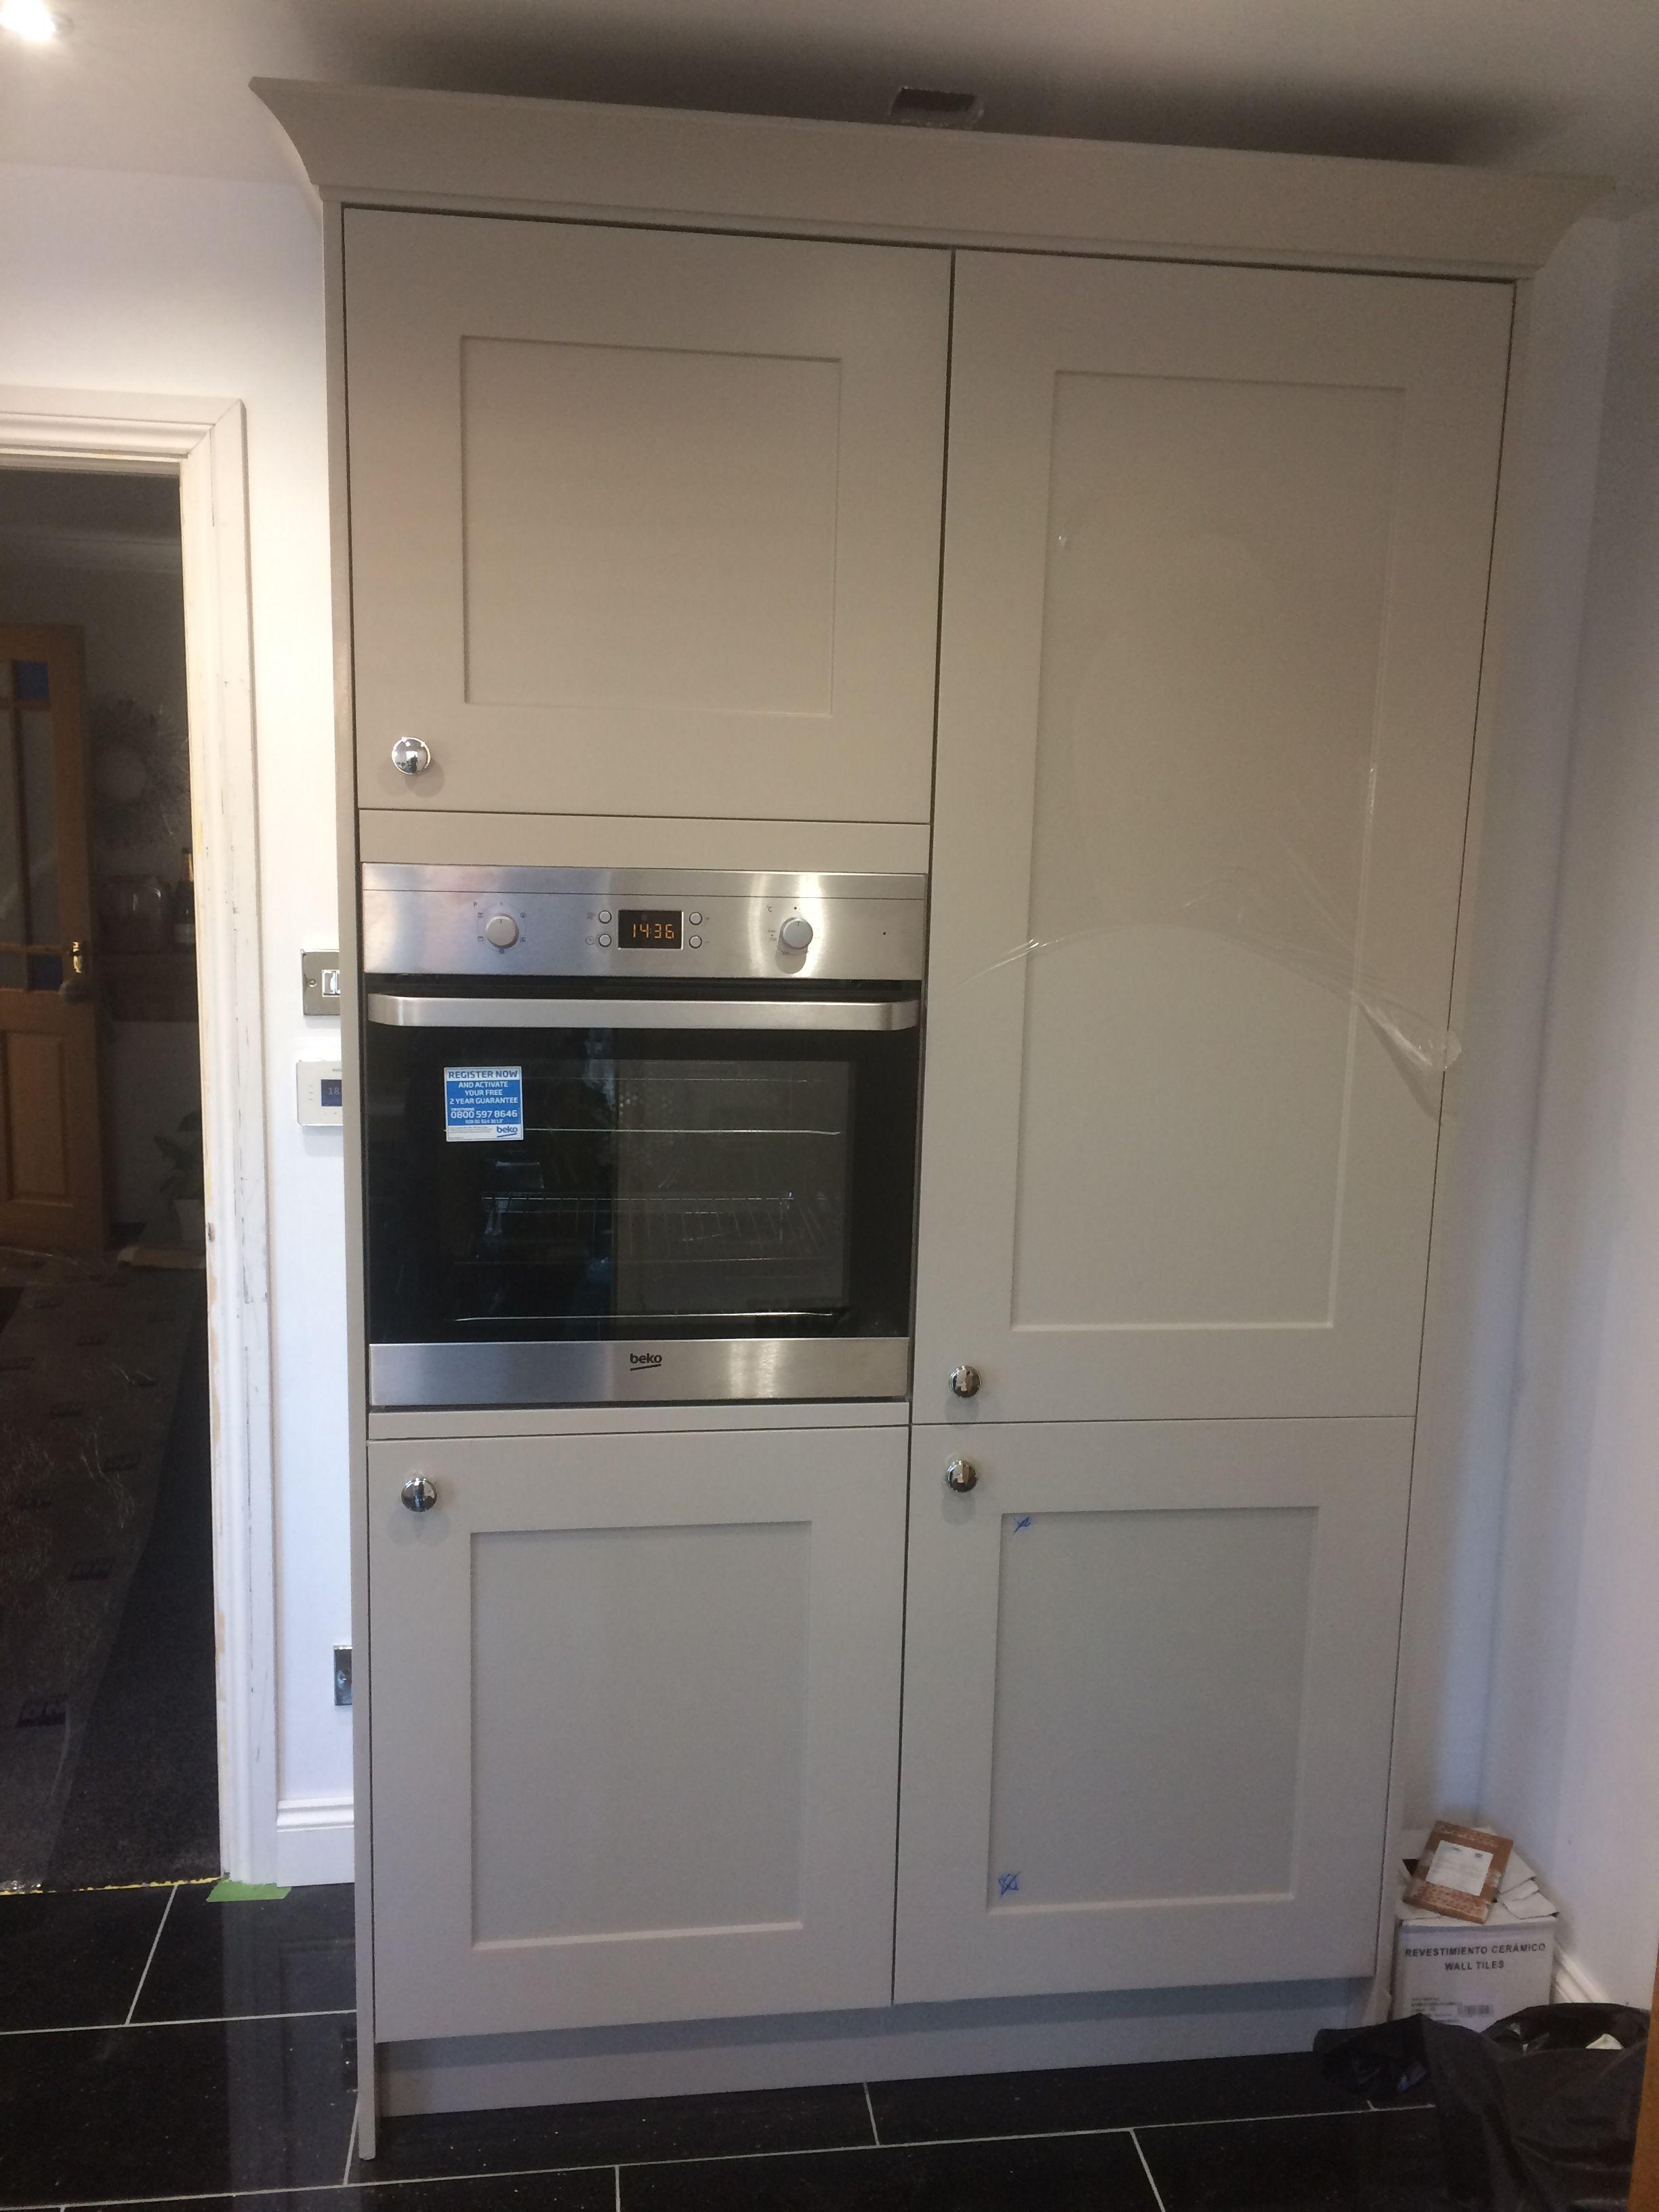 Built In Fridge Freezer And Oven Housing Unit Kitchen Built Ins